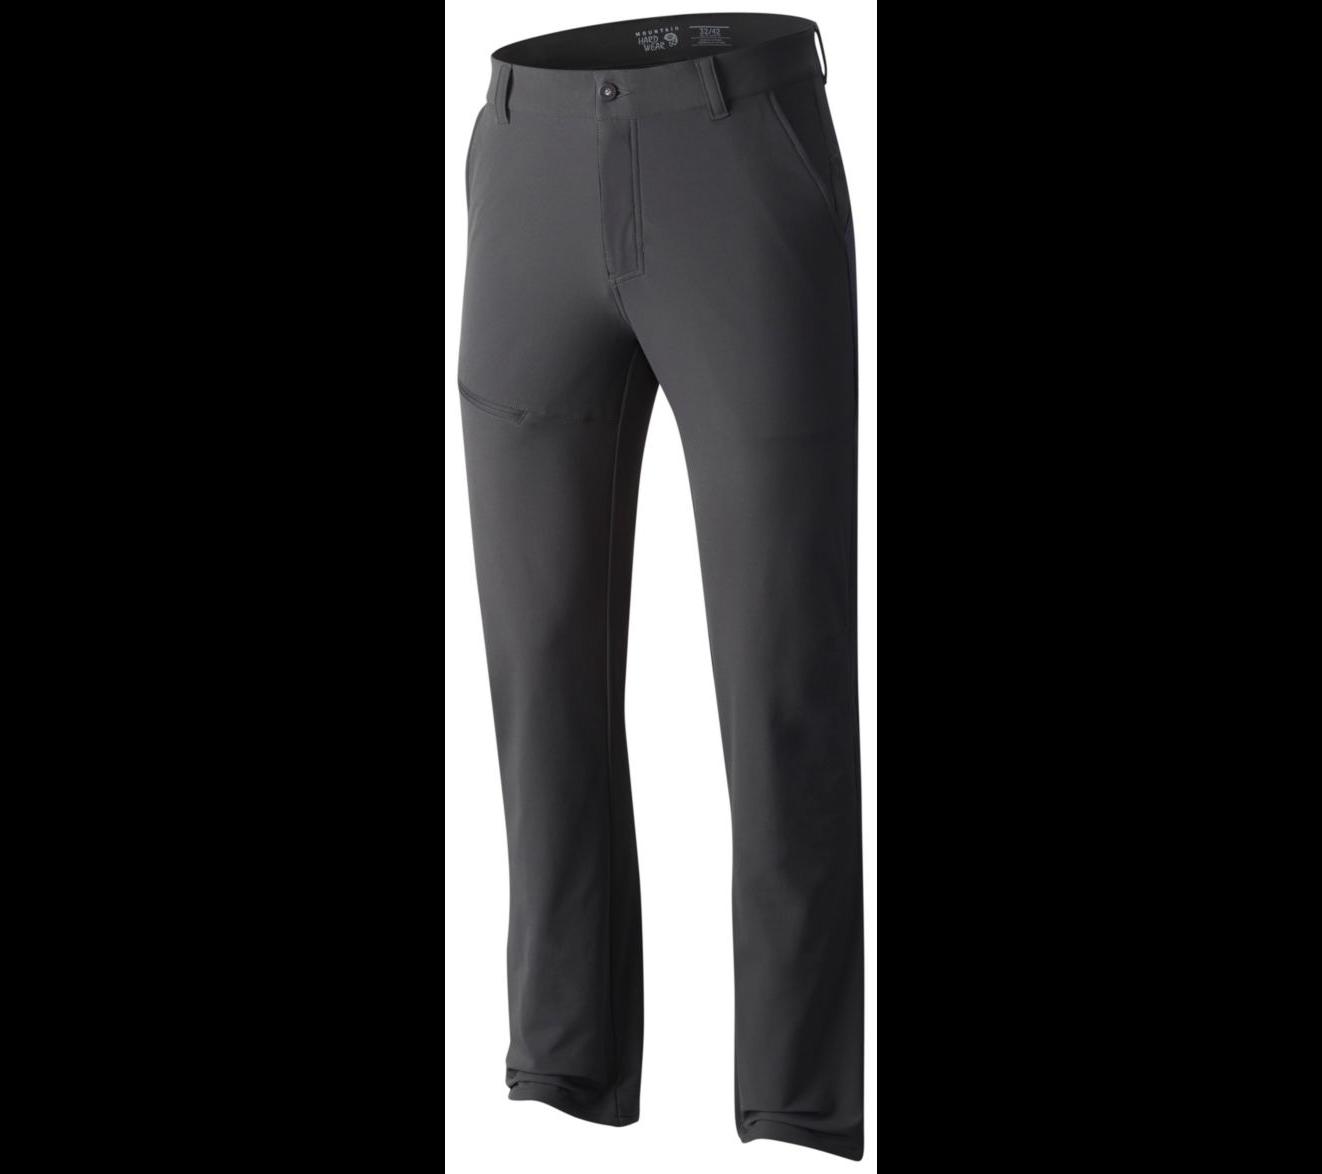 Mountain Hardwear Men's Chockstone 24/7 Hike Pants JR1MHch247